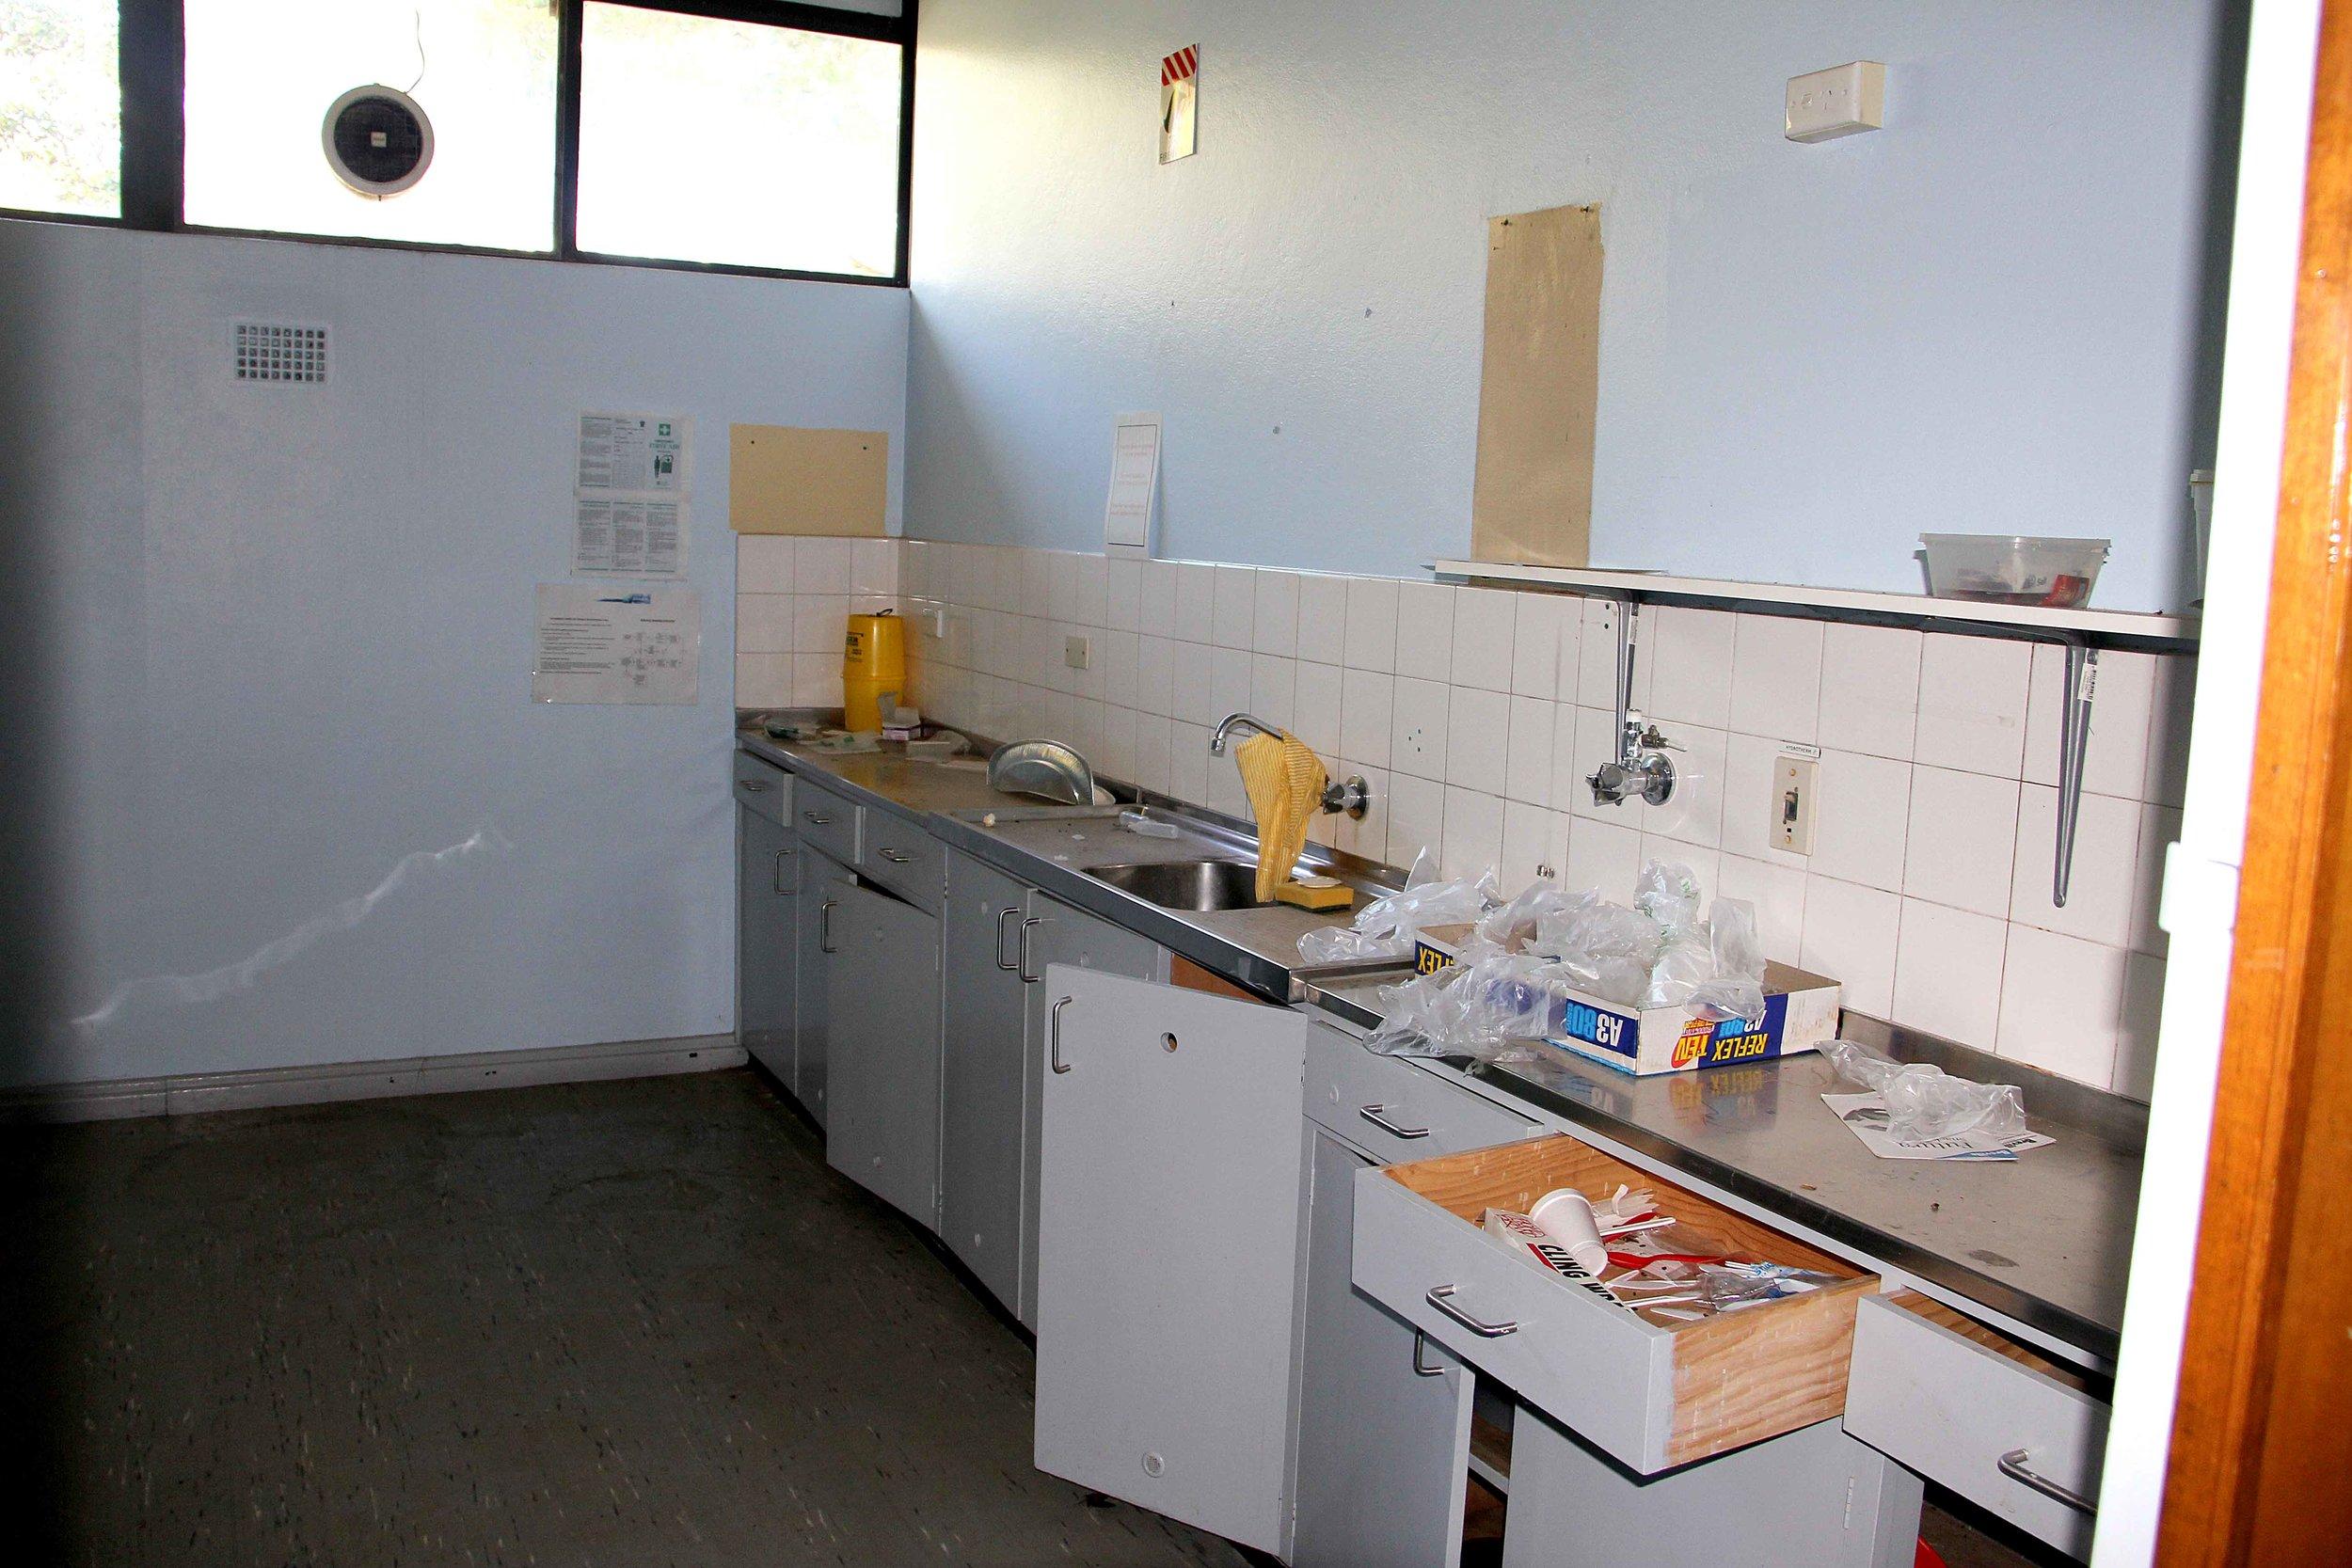 32 south upstairs kitchen.jpg